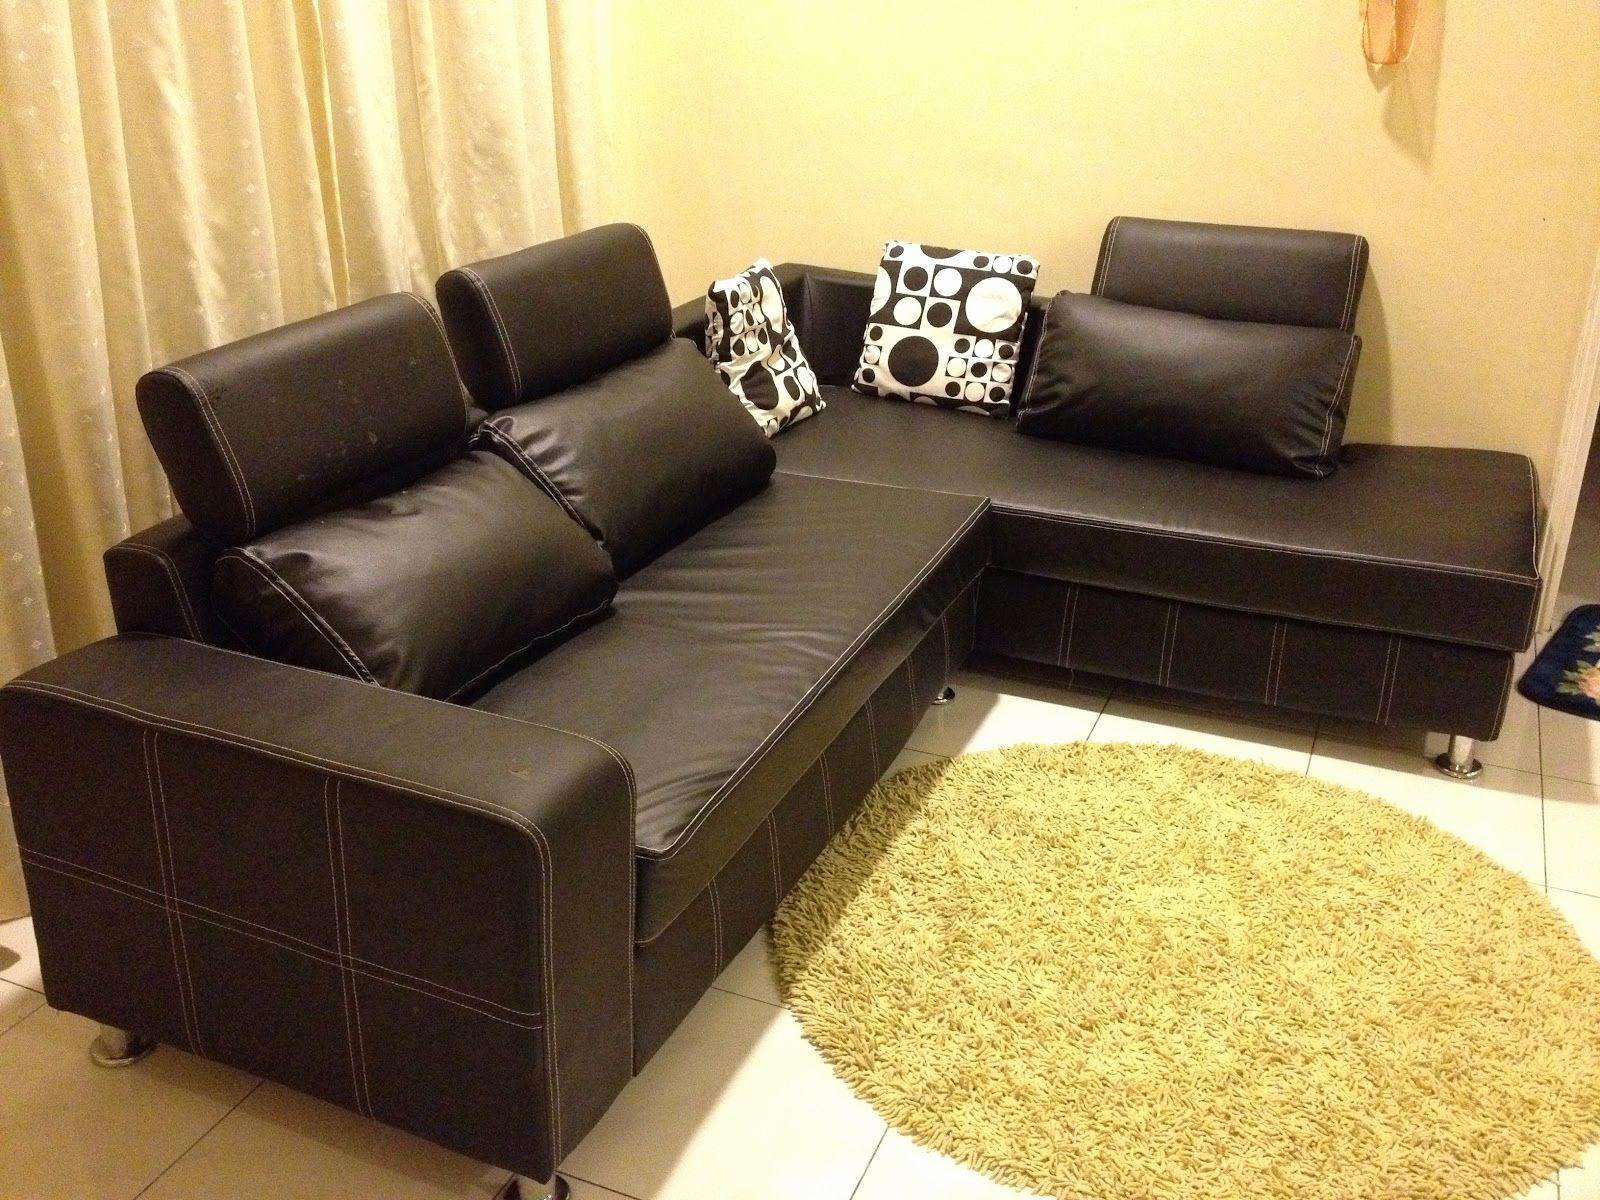 Unique Microfiber Sectional Sofas For Lovely Sofa Design Brilliant